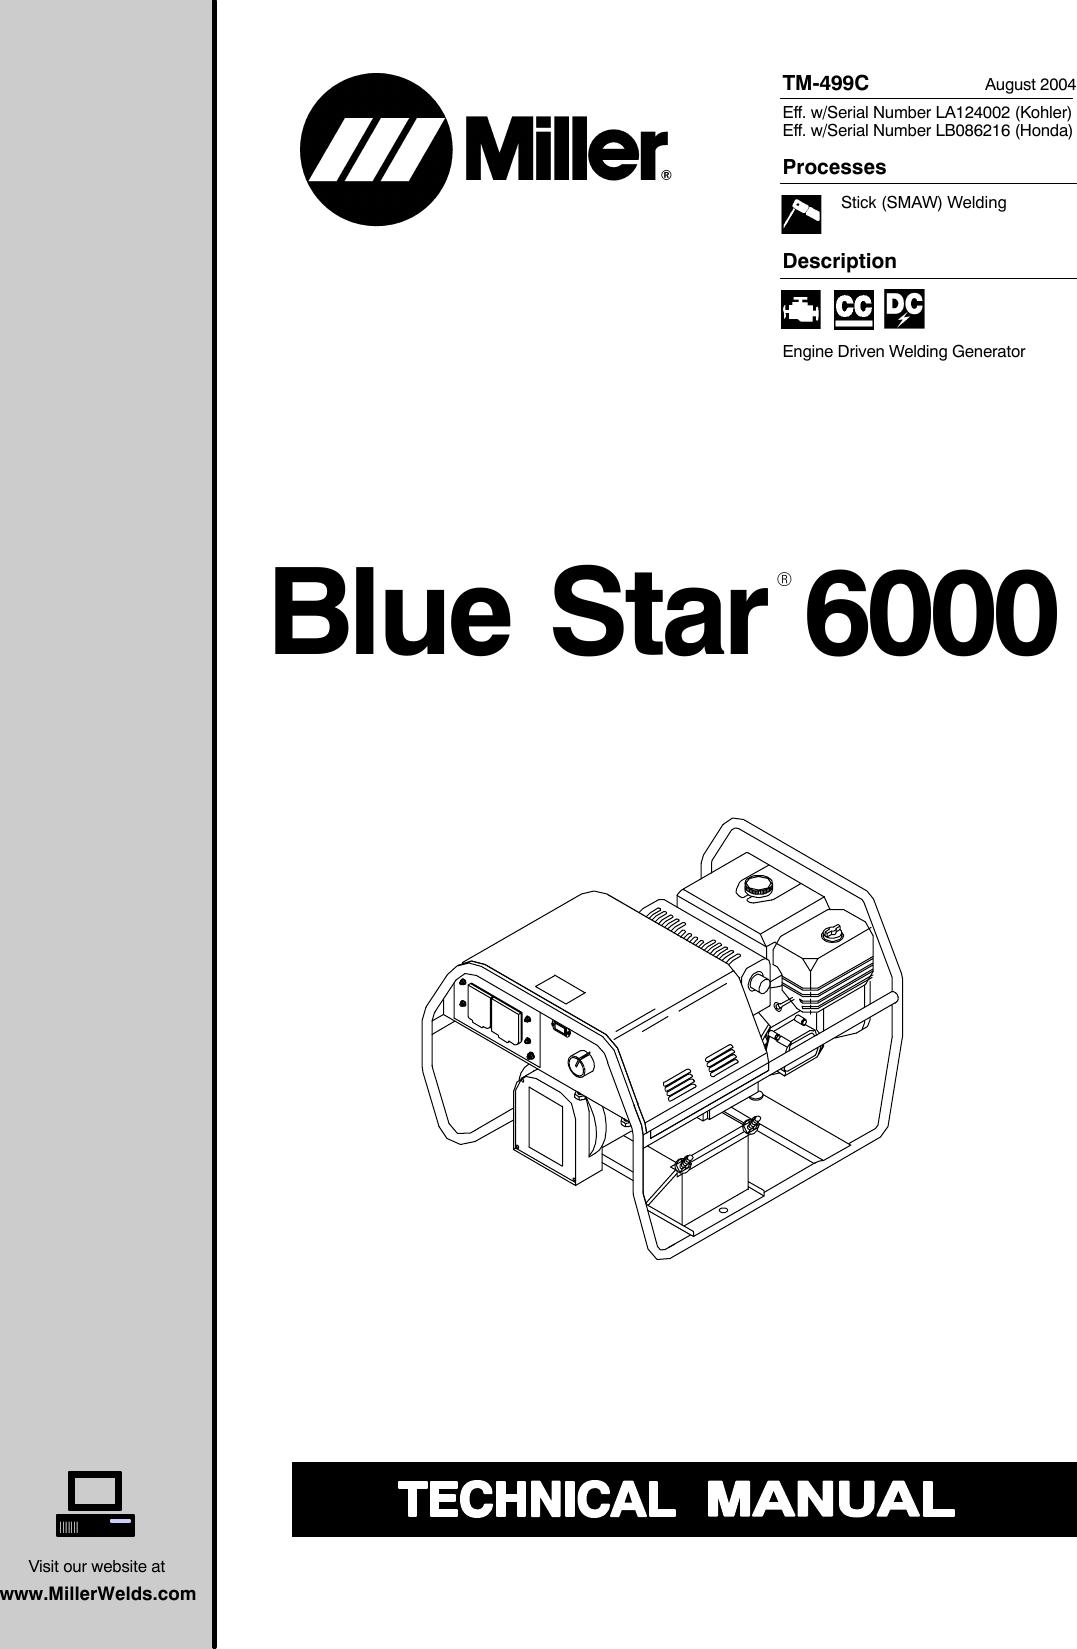 Miller Electric Blue Star 6000 Tm 499c Users Manual T499c Mil Welding Generator Diagram